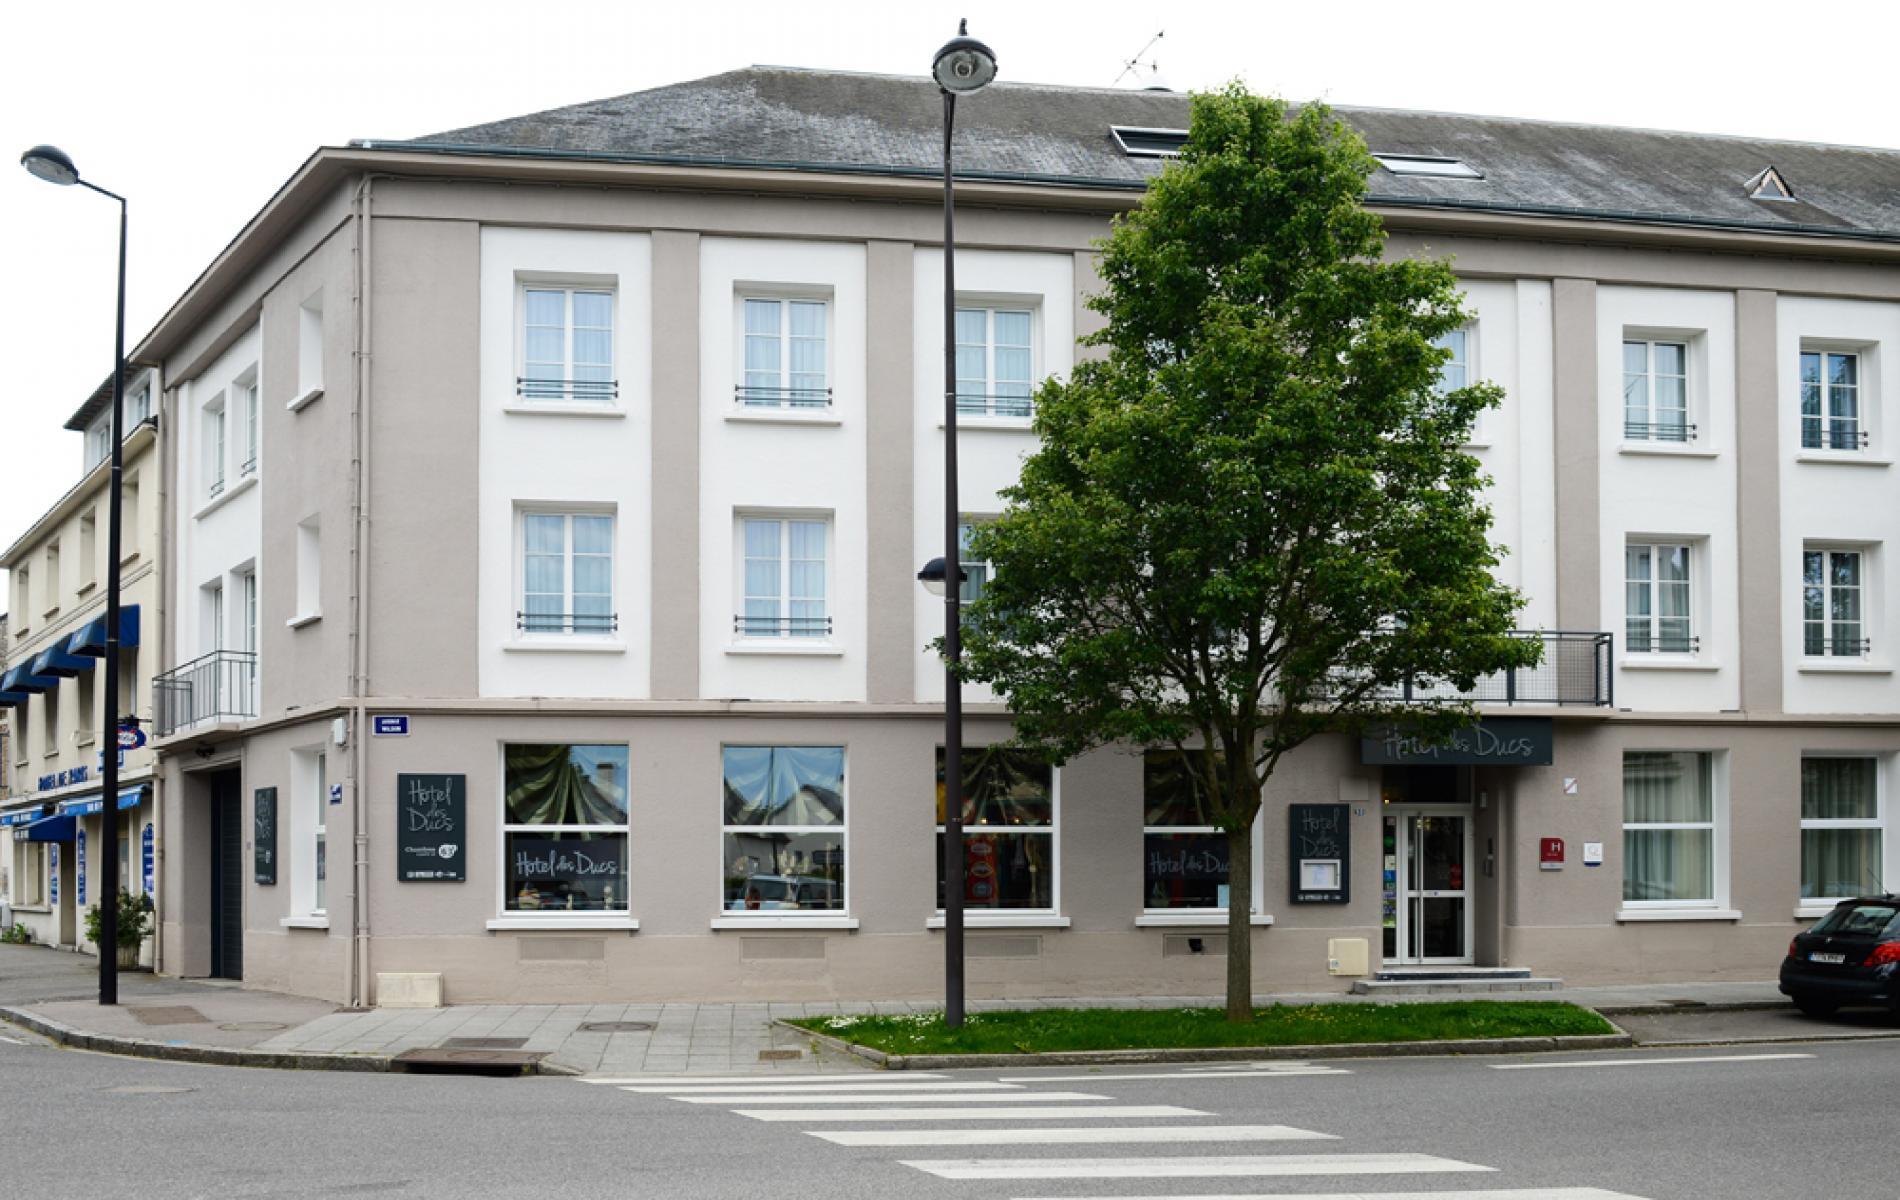 Hotel des Ducs - Hotel en Normandie